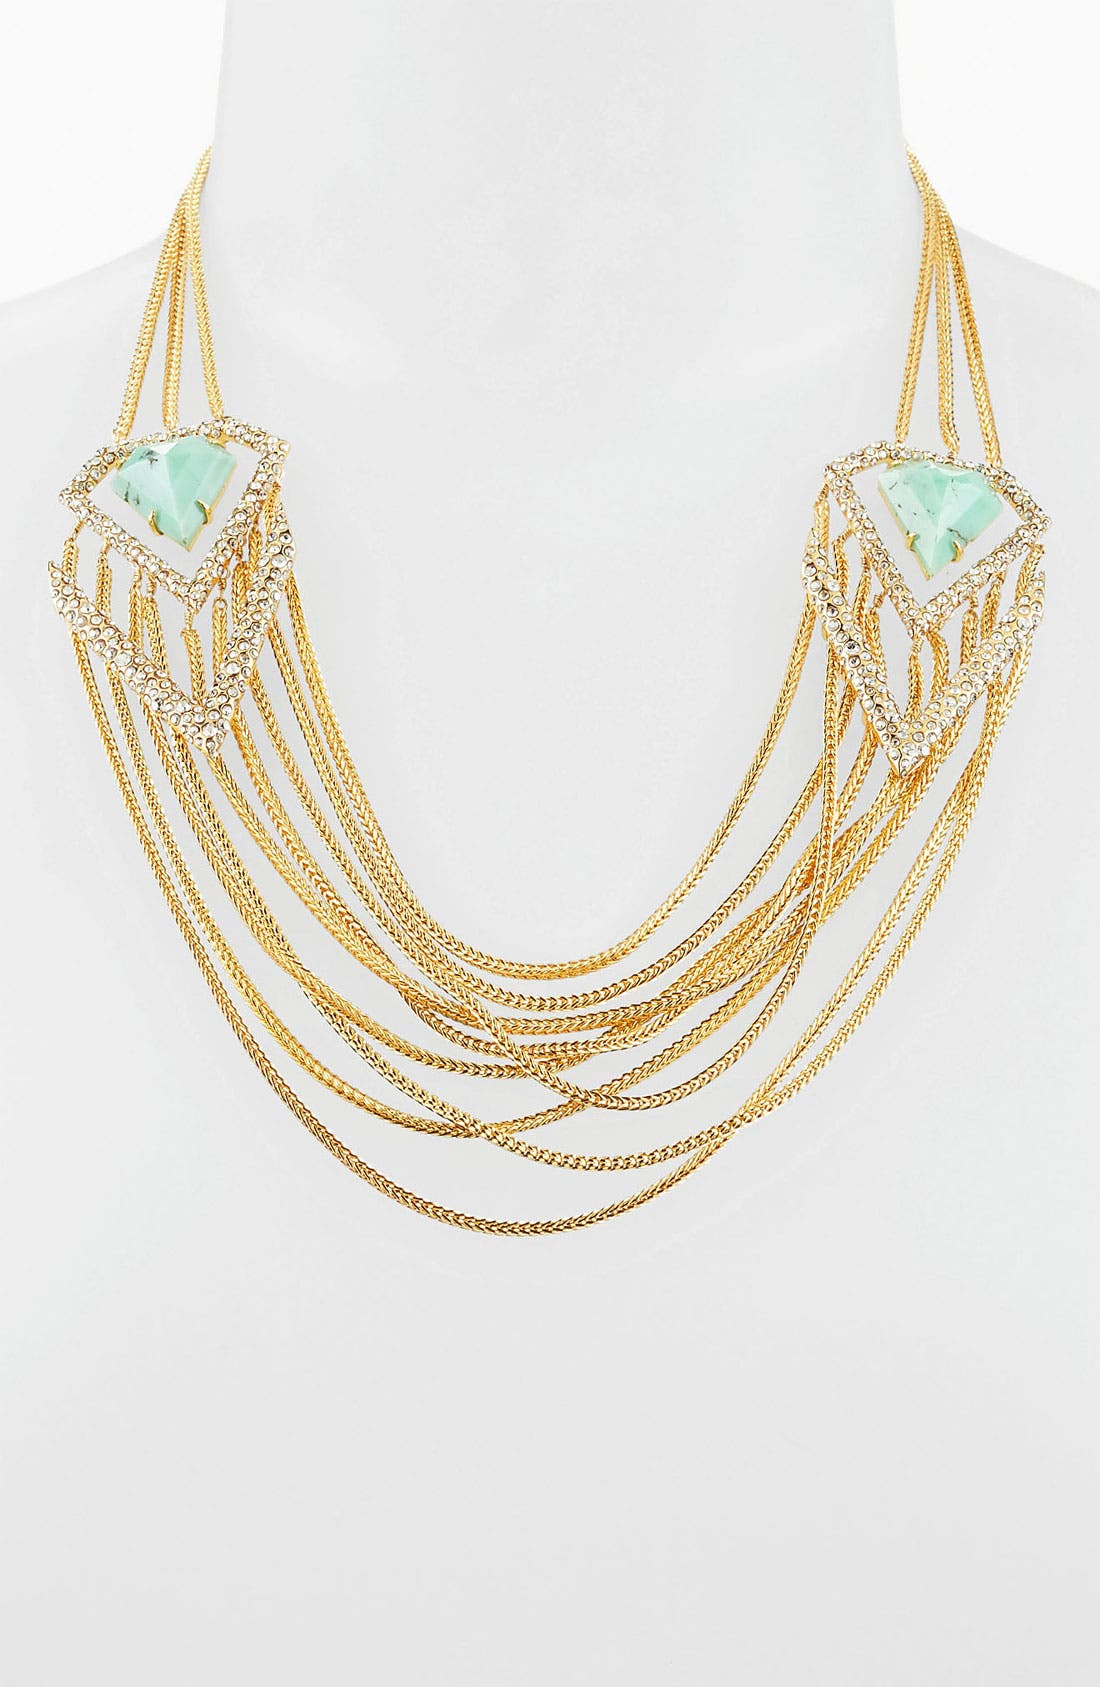 Main Image - Alexis Bittar 'Miss Havisham - New Wave' Multistrand Necklace